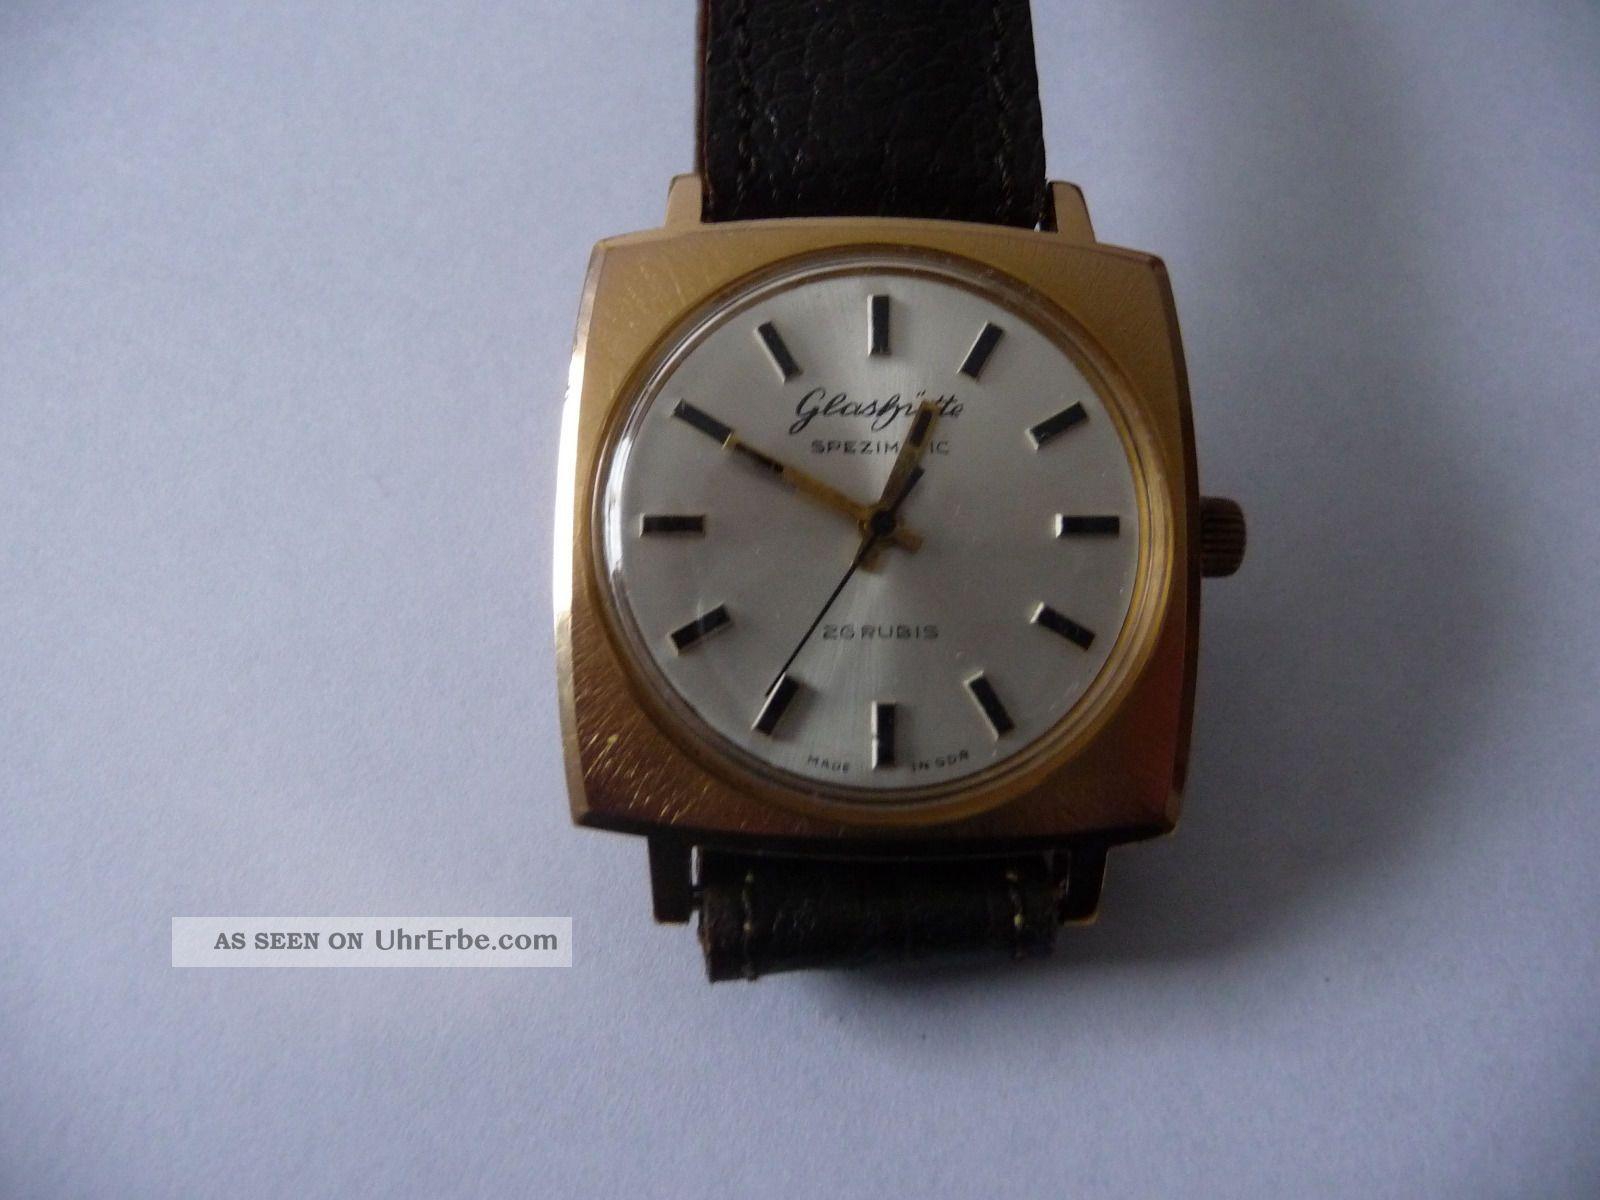 Glashütte Spezimatic Armbanduhren Bild